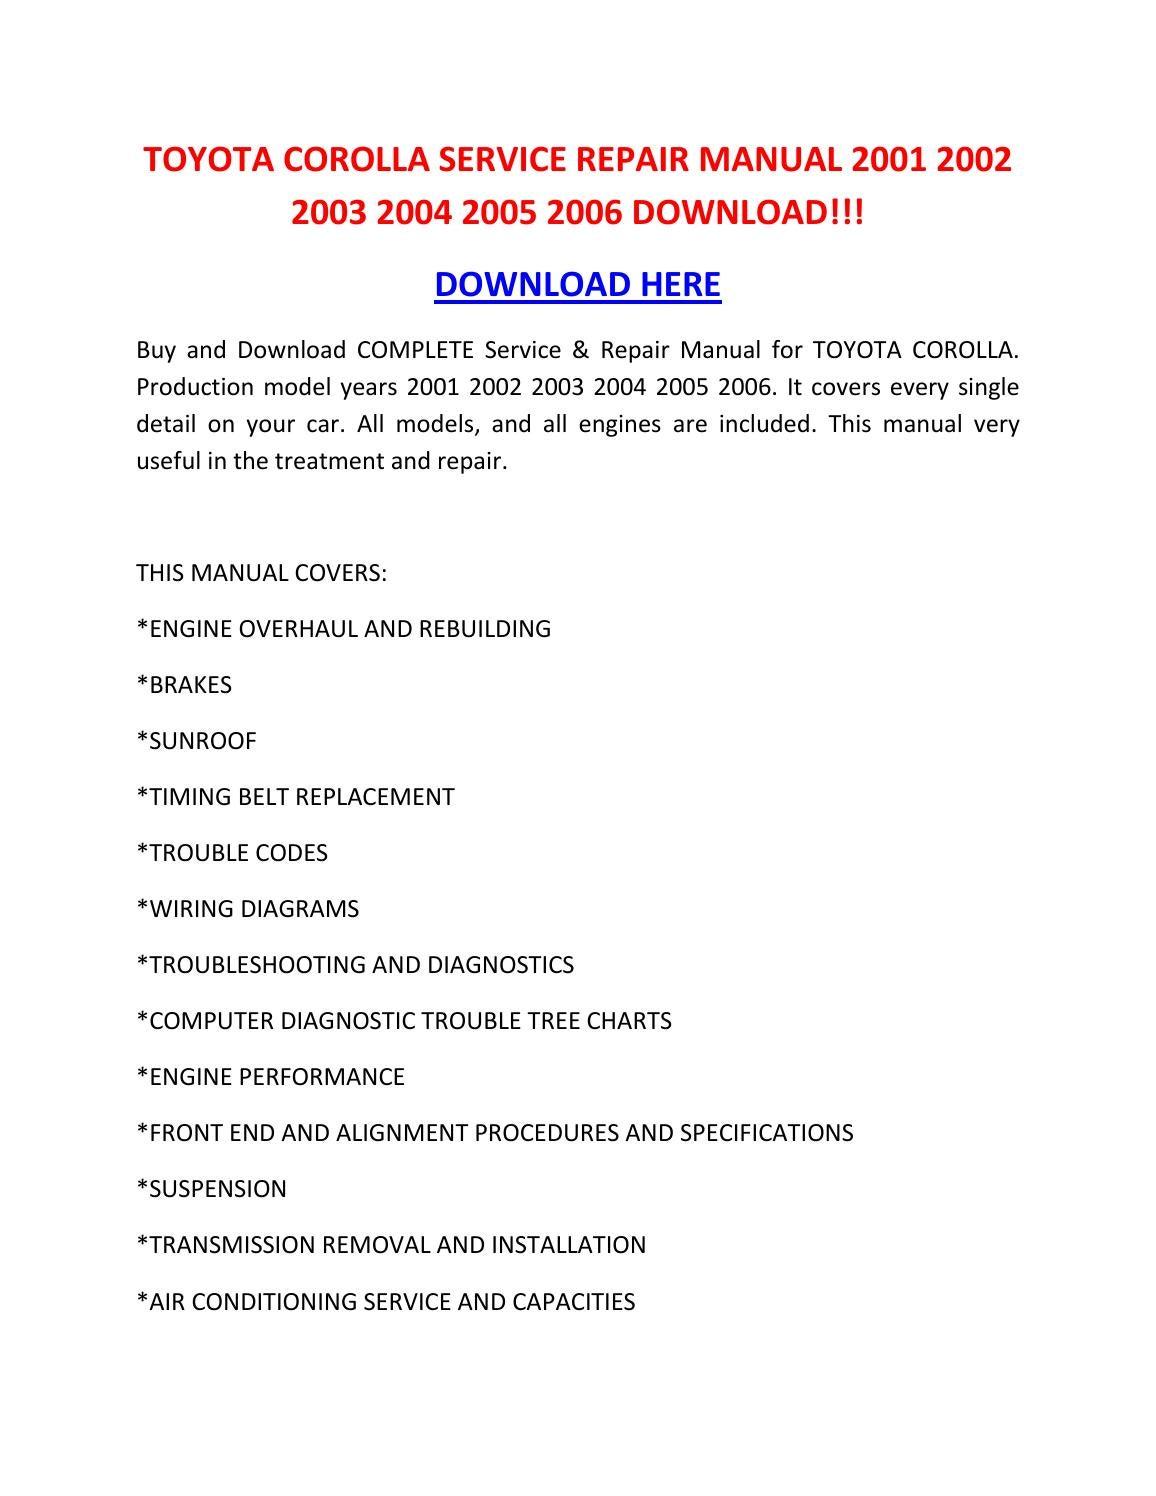 2006 toyota corolla service manual download